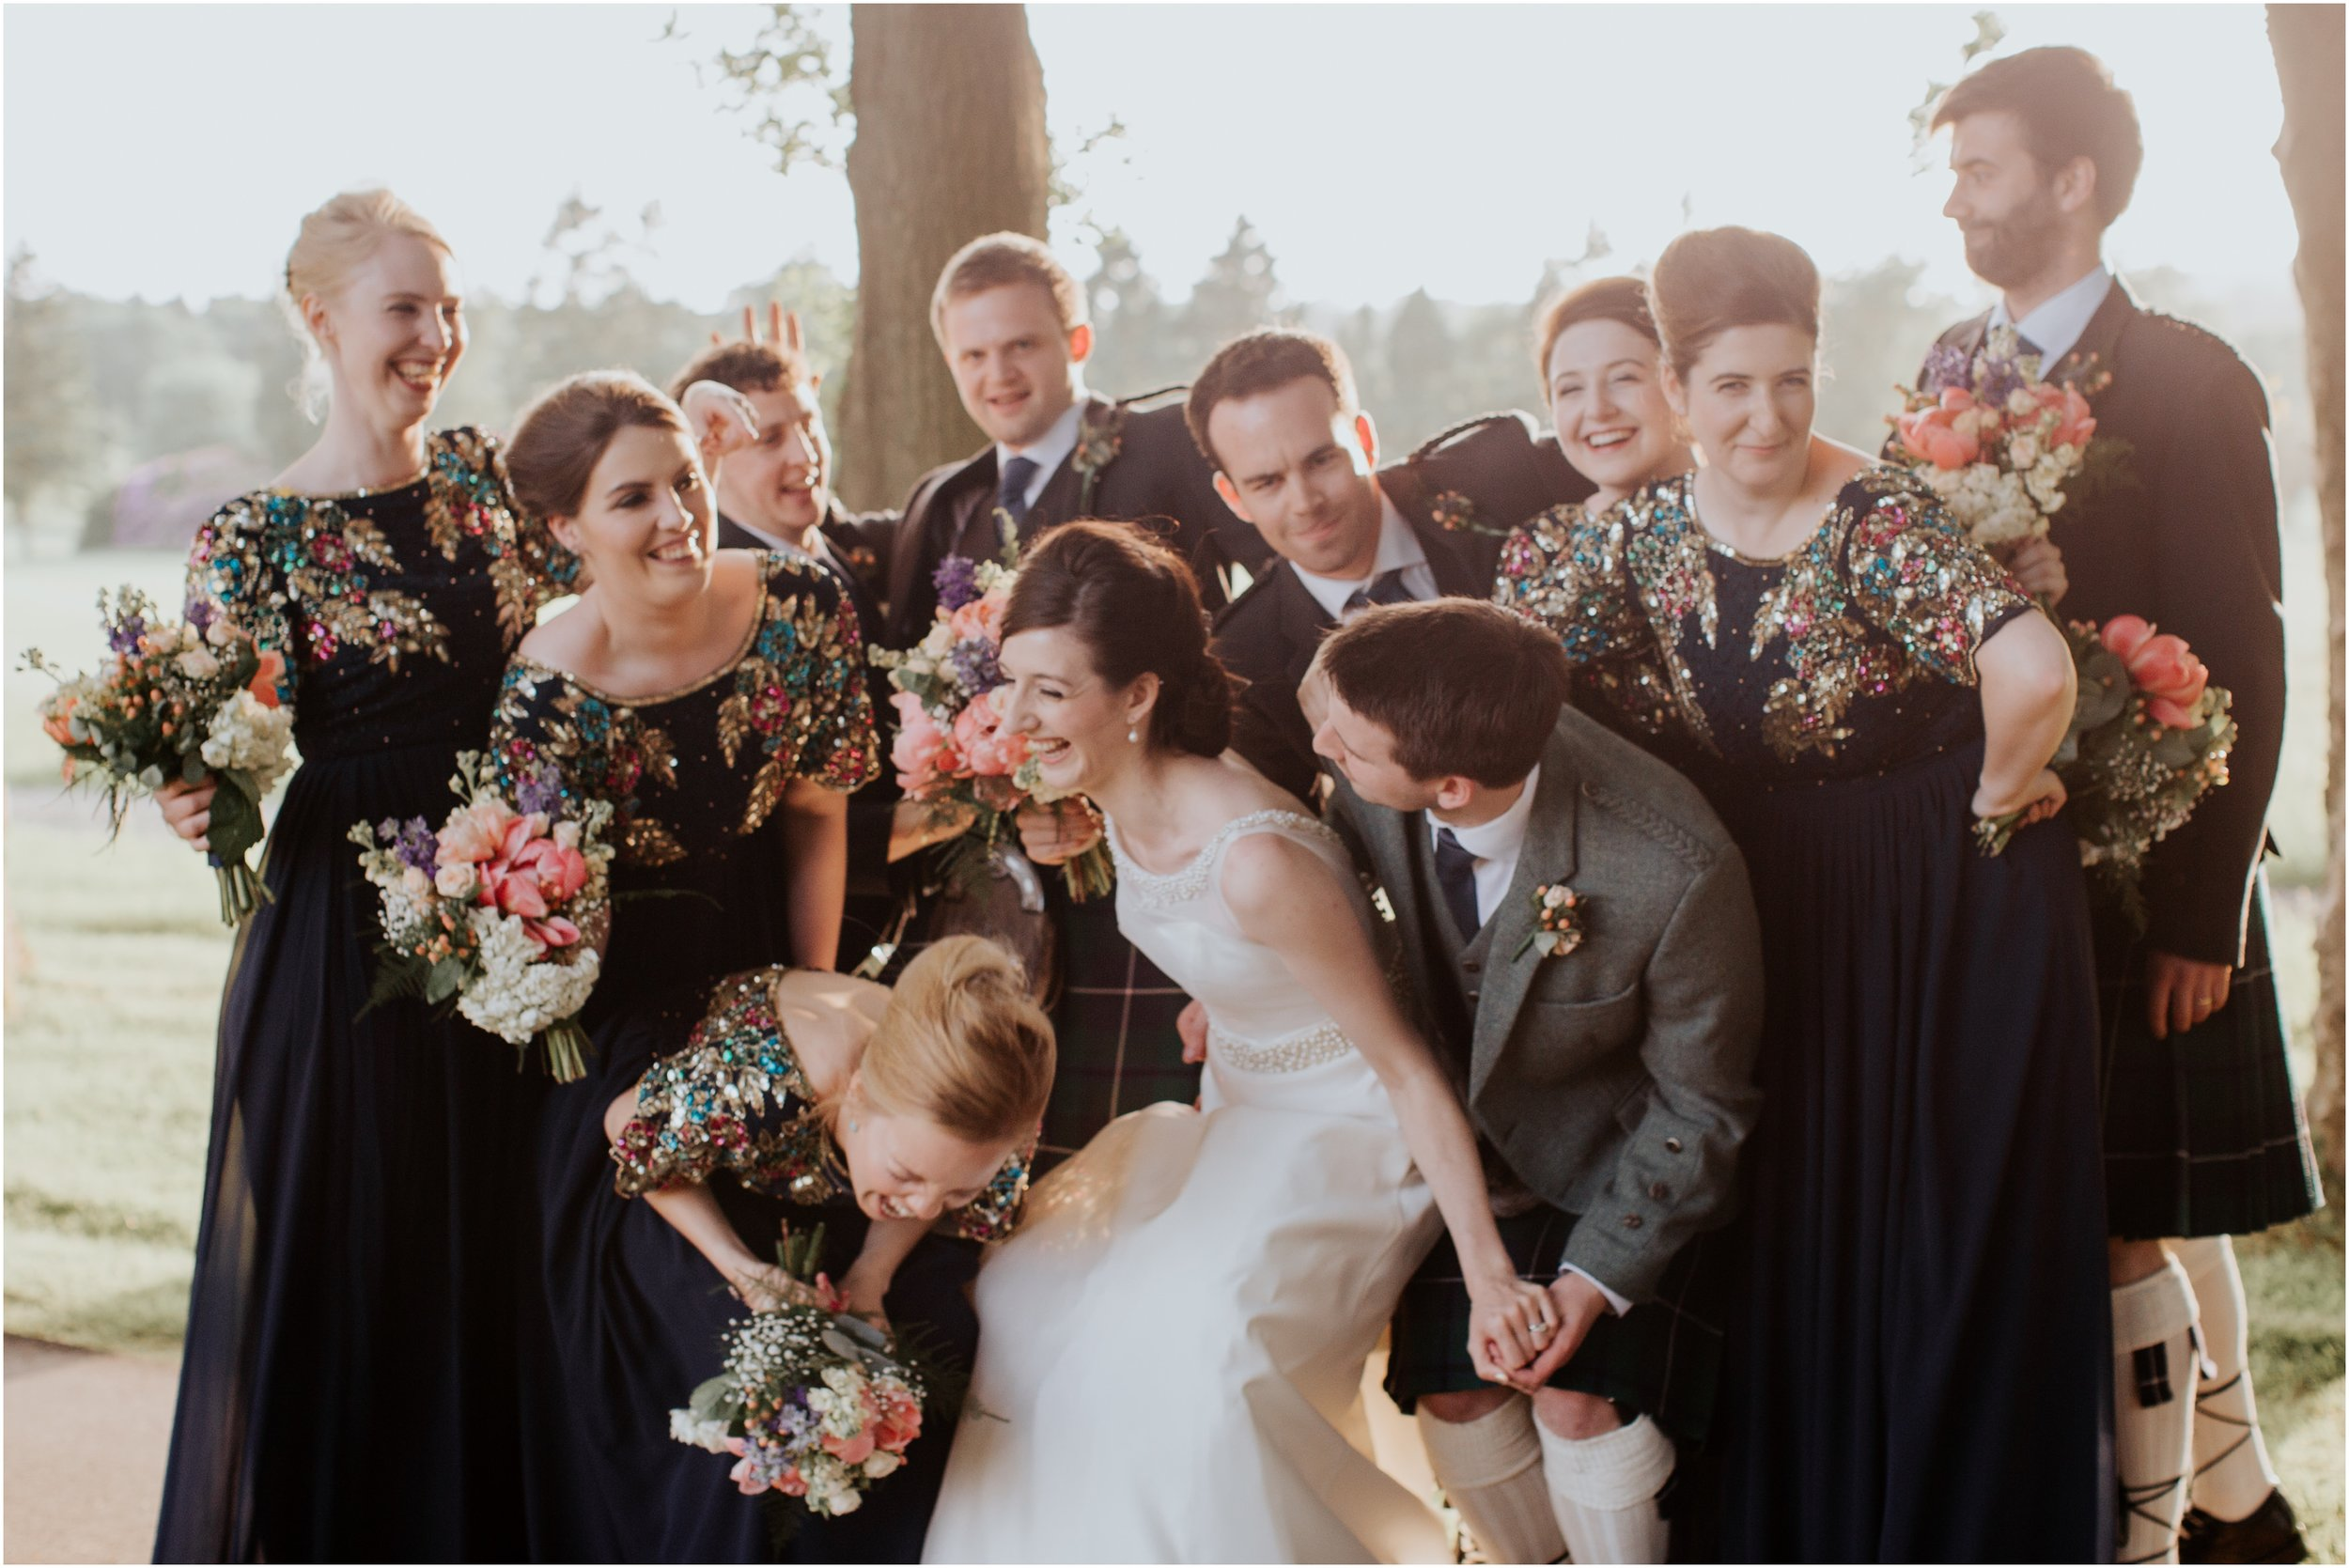 Photography 78 - Glasgow Wedding Photographer - Year in Reveiw_0068.jpg